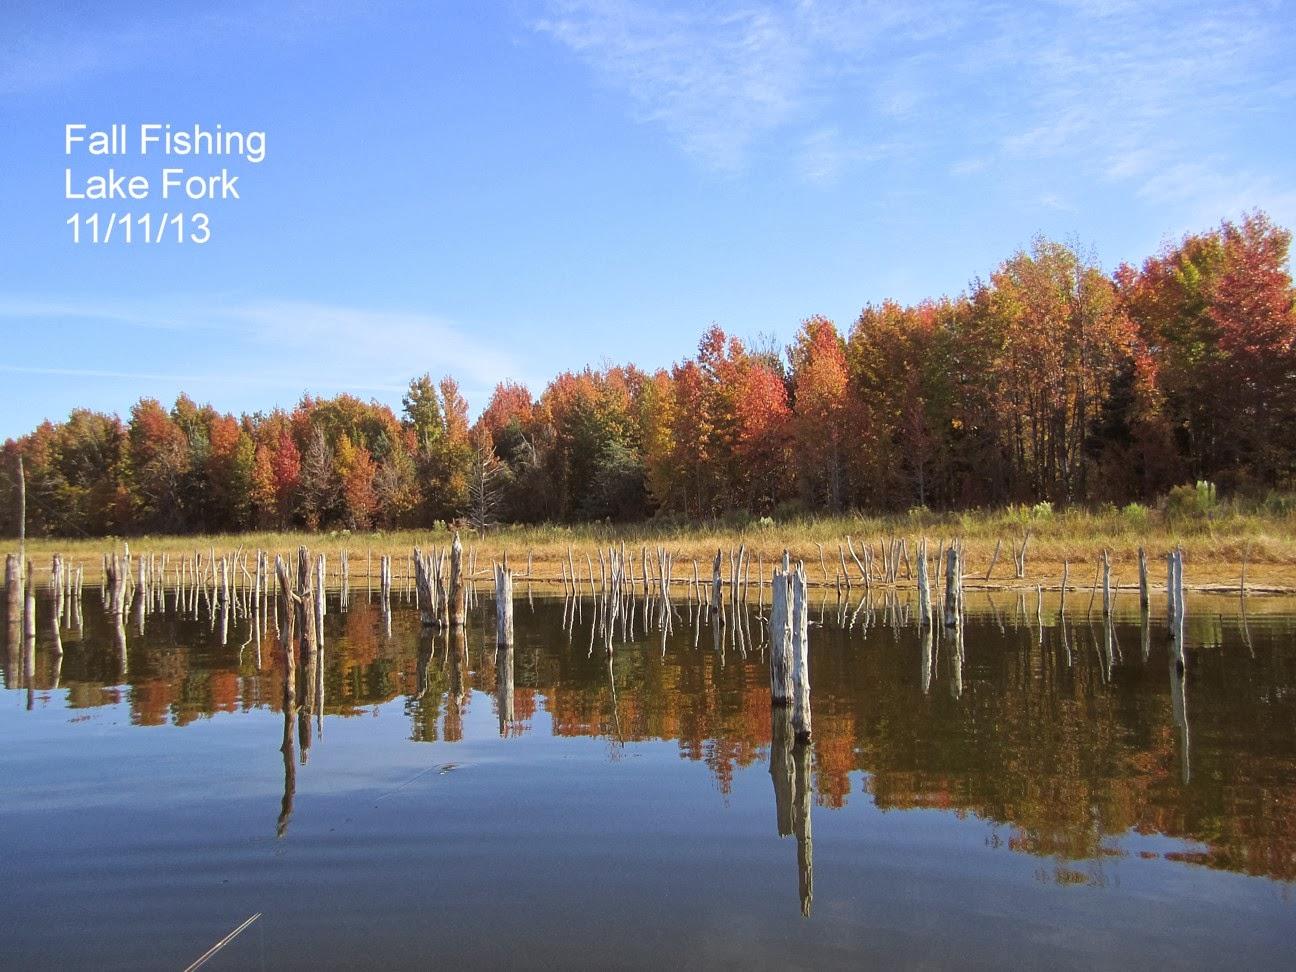 Don o 39 s lake fork fishing adventures november 2013 for Lake fork fishing hot spots